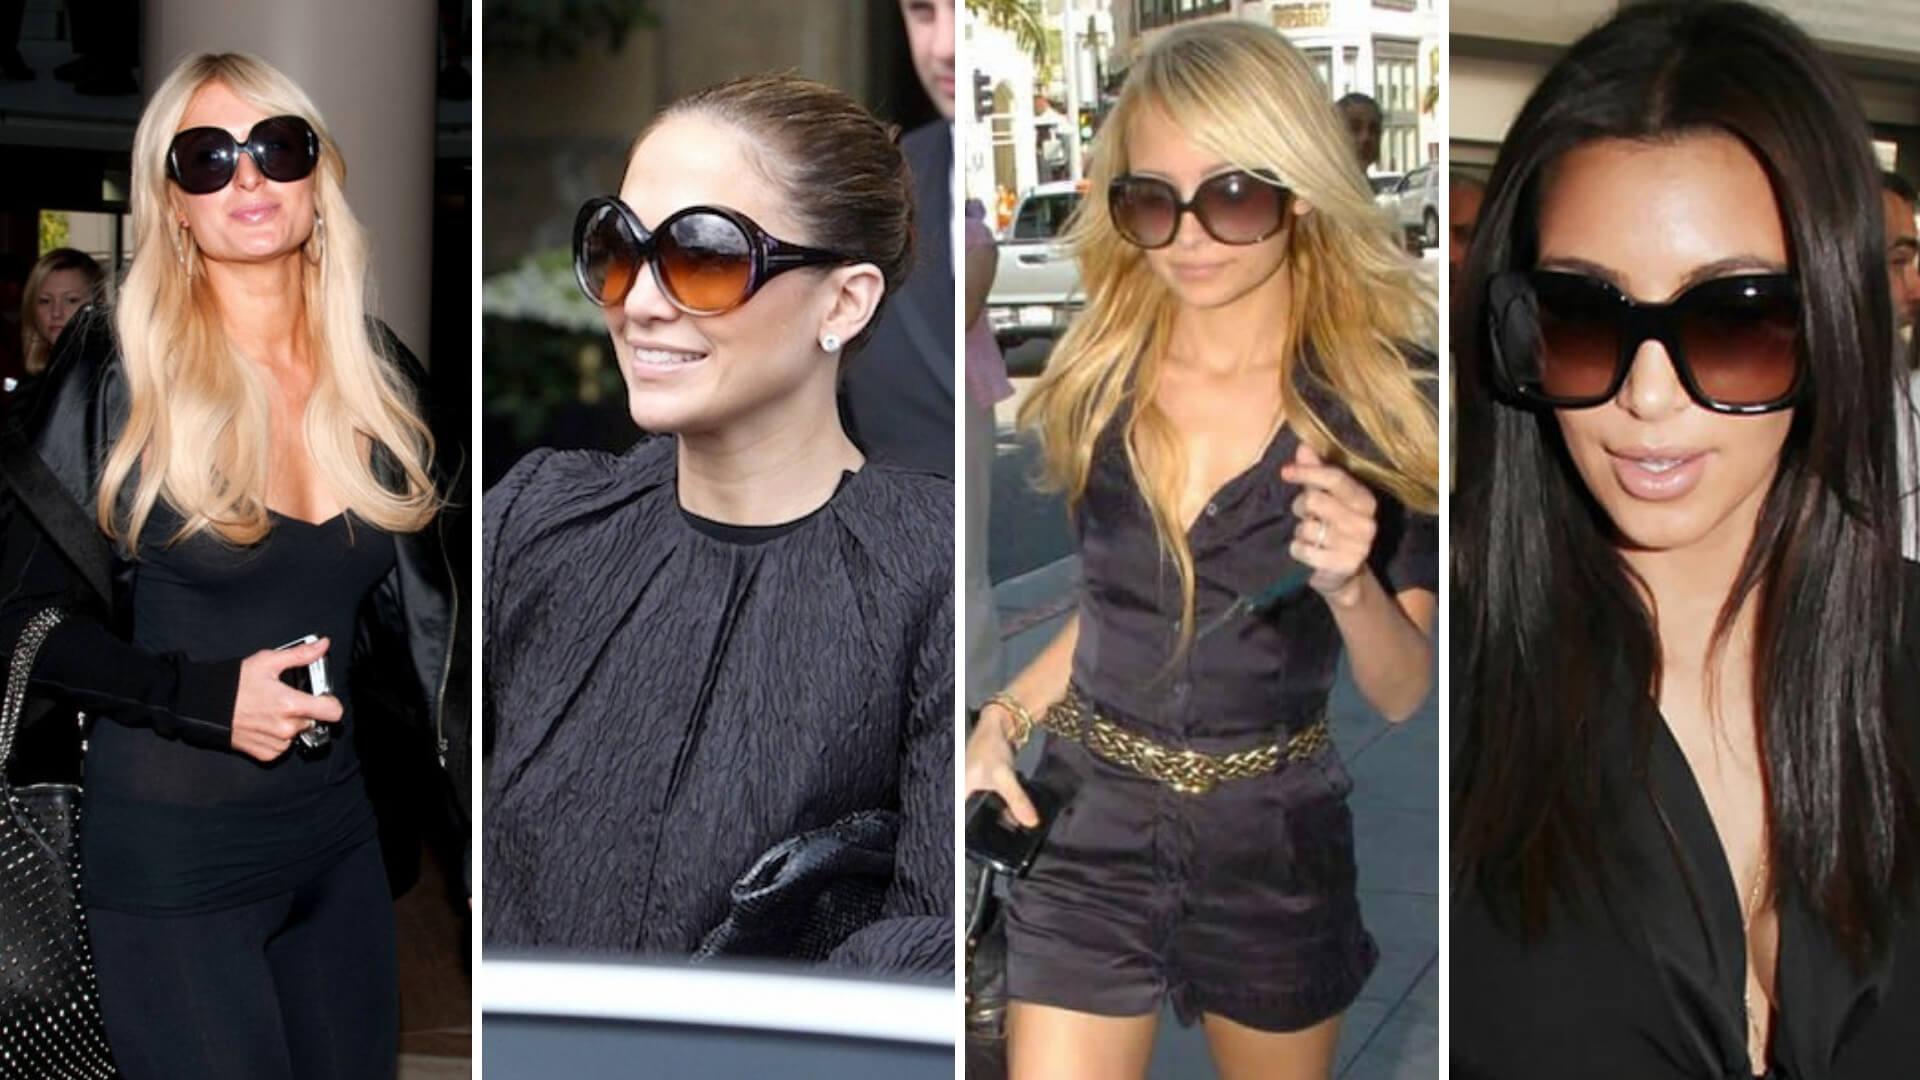 c82f49b02 Aké okuliare nosia vaše obľúbené celebrity? - DUOS BLOG